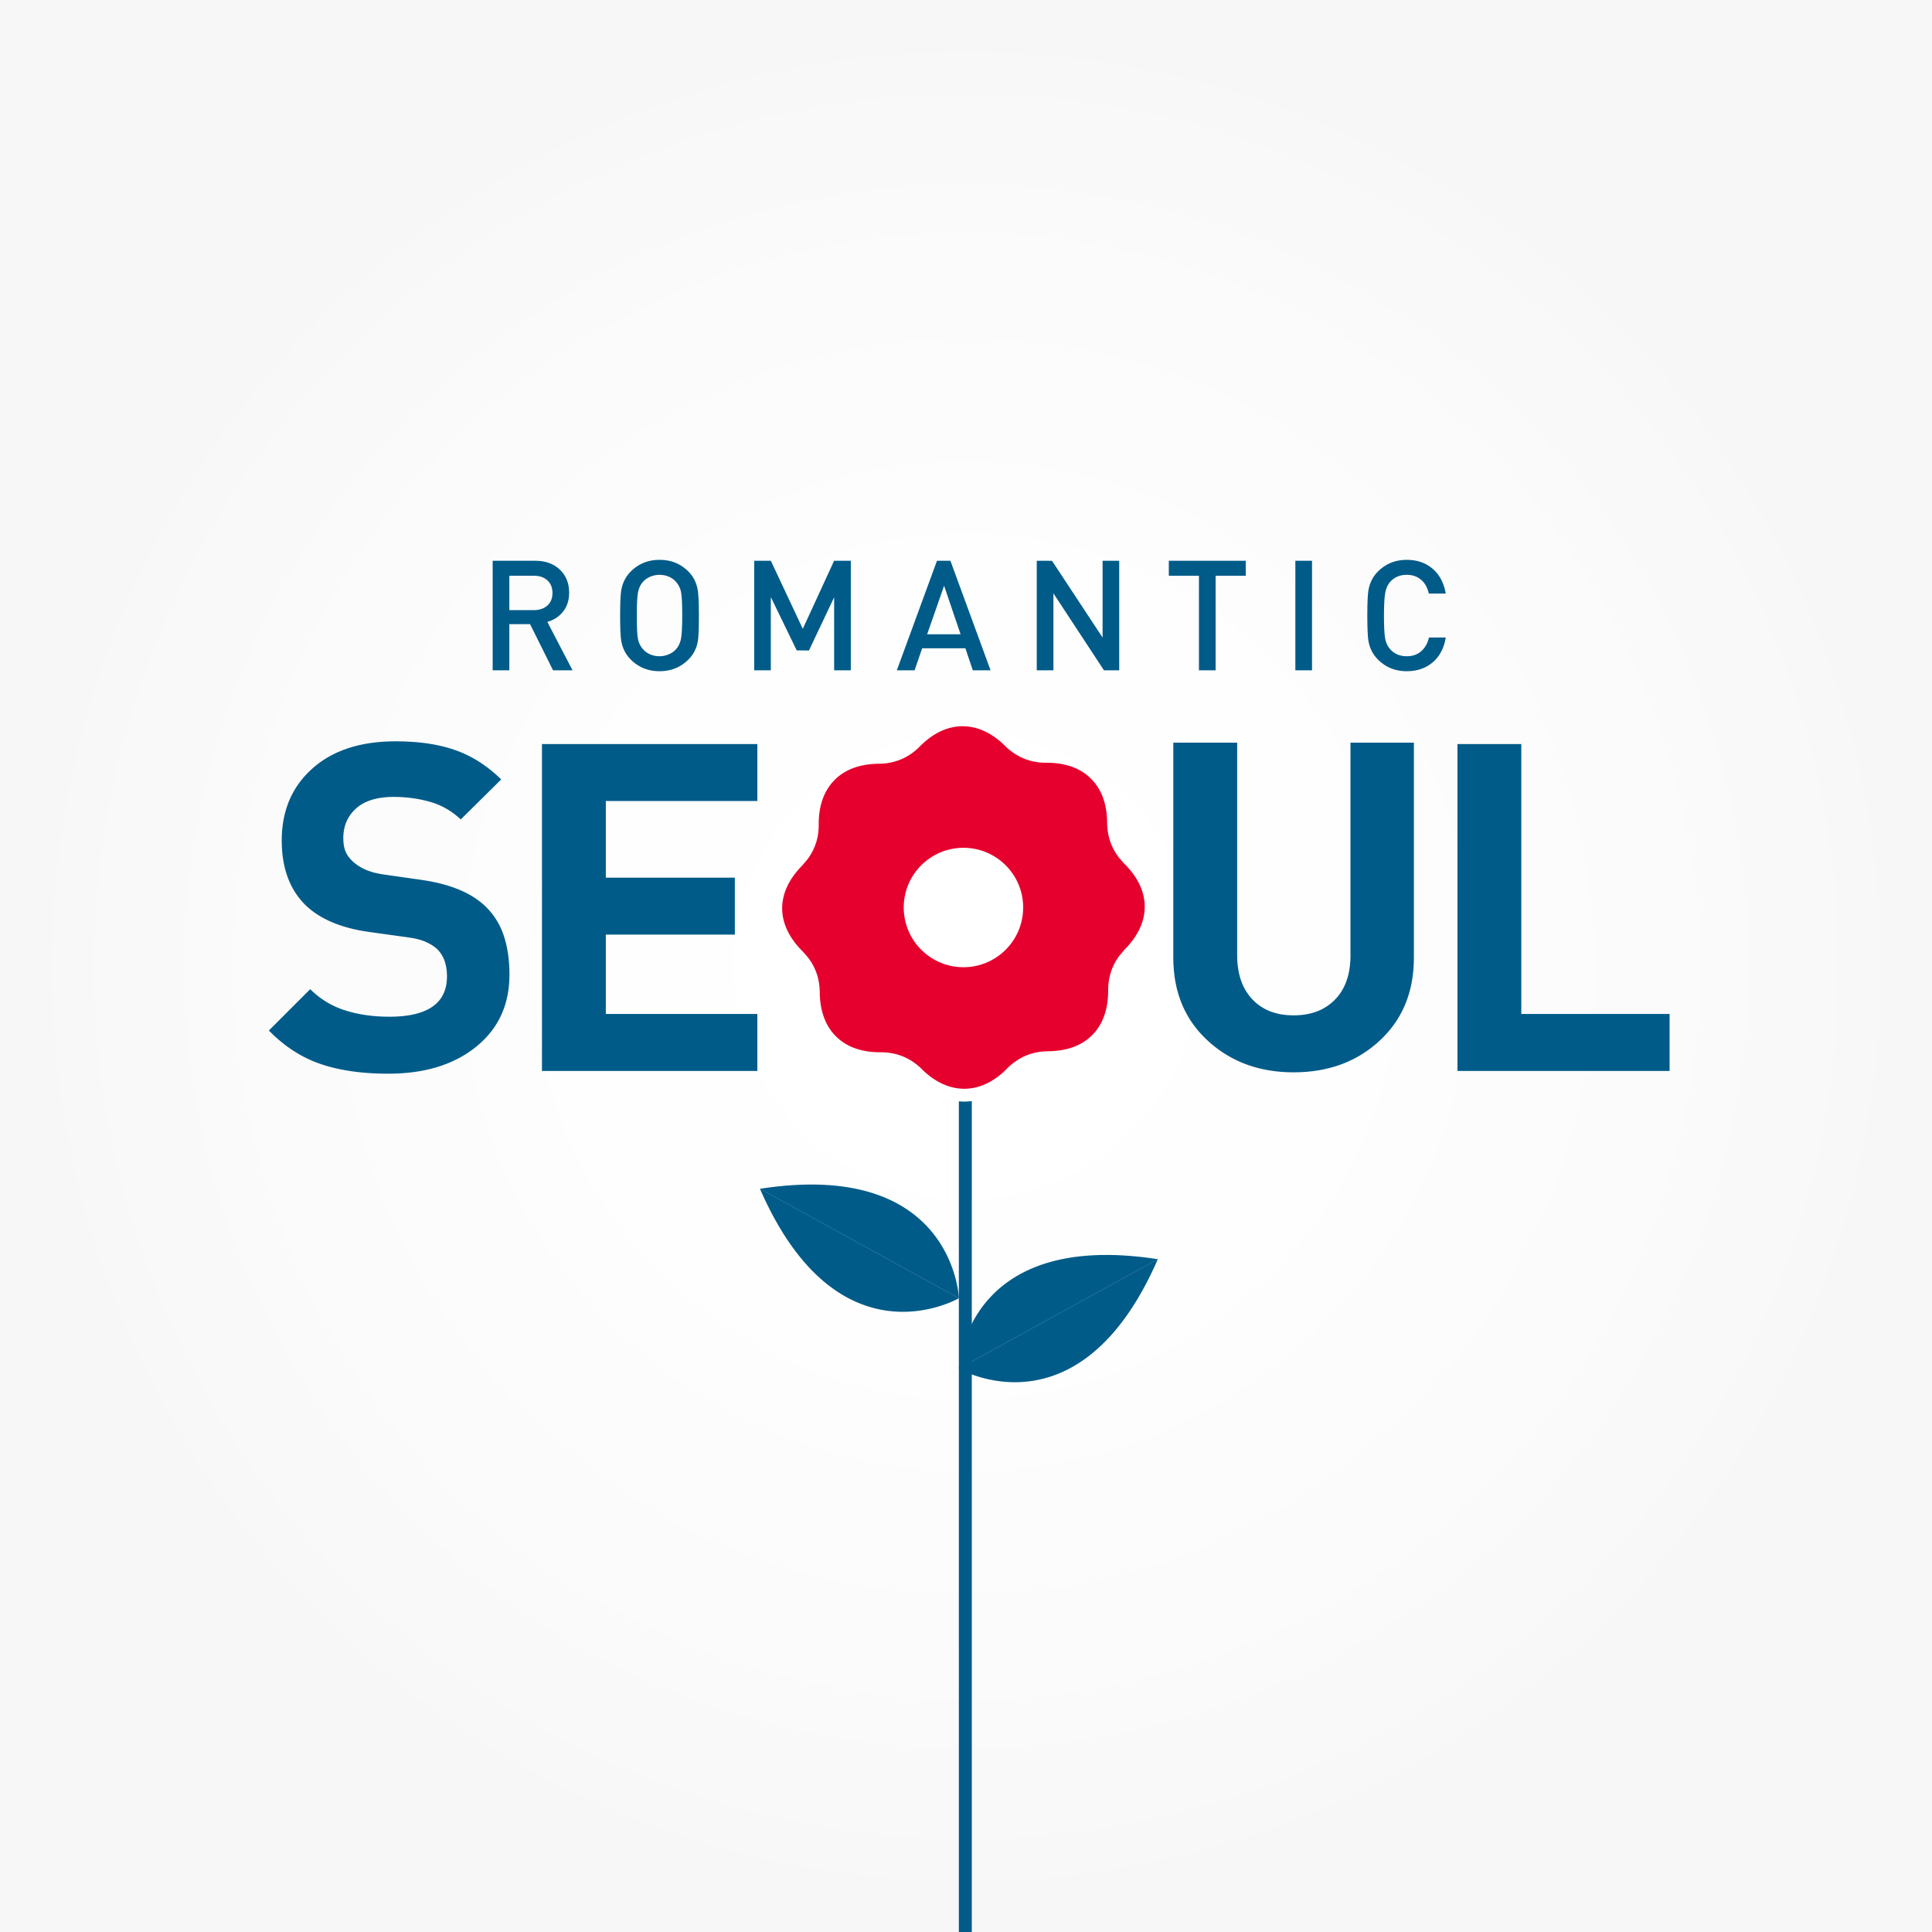 Seoul Typography Contest - Kim Hongji